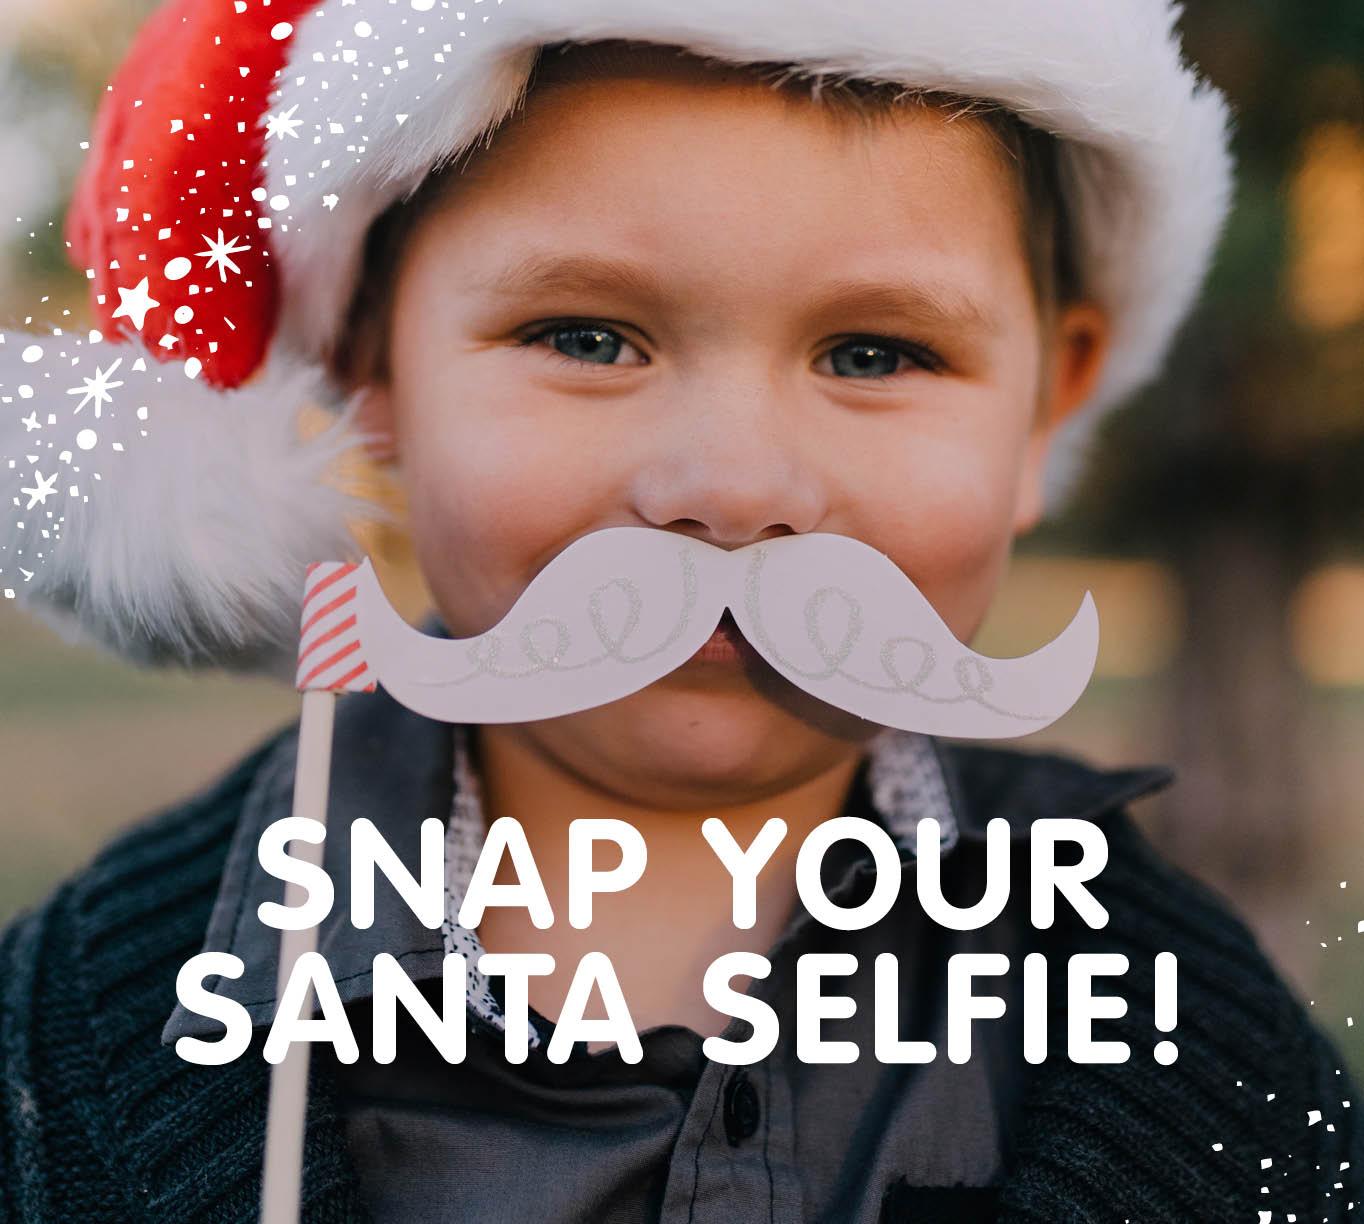 CH4432_Charter Hall Xmas Roll Out_Webtiles_Santa Selfie-NewWebsite_@2-682x612